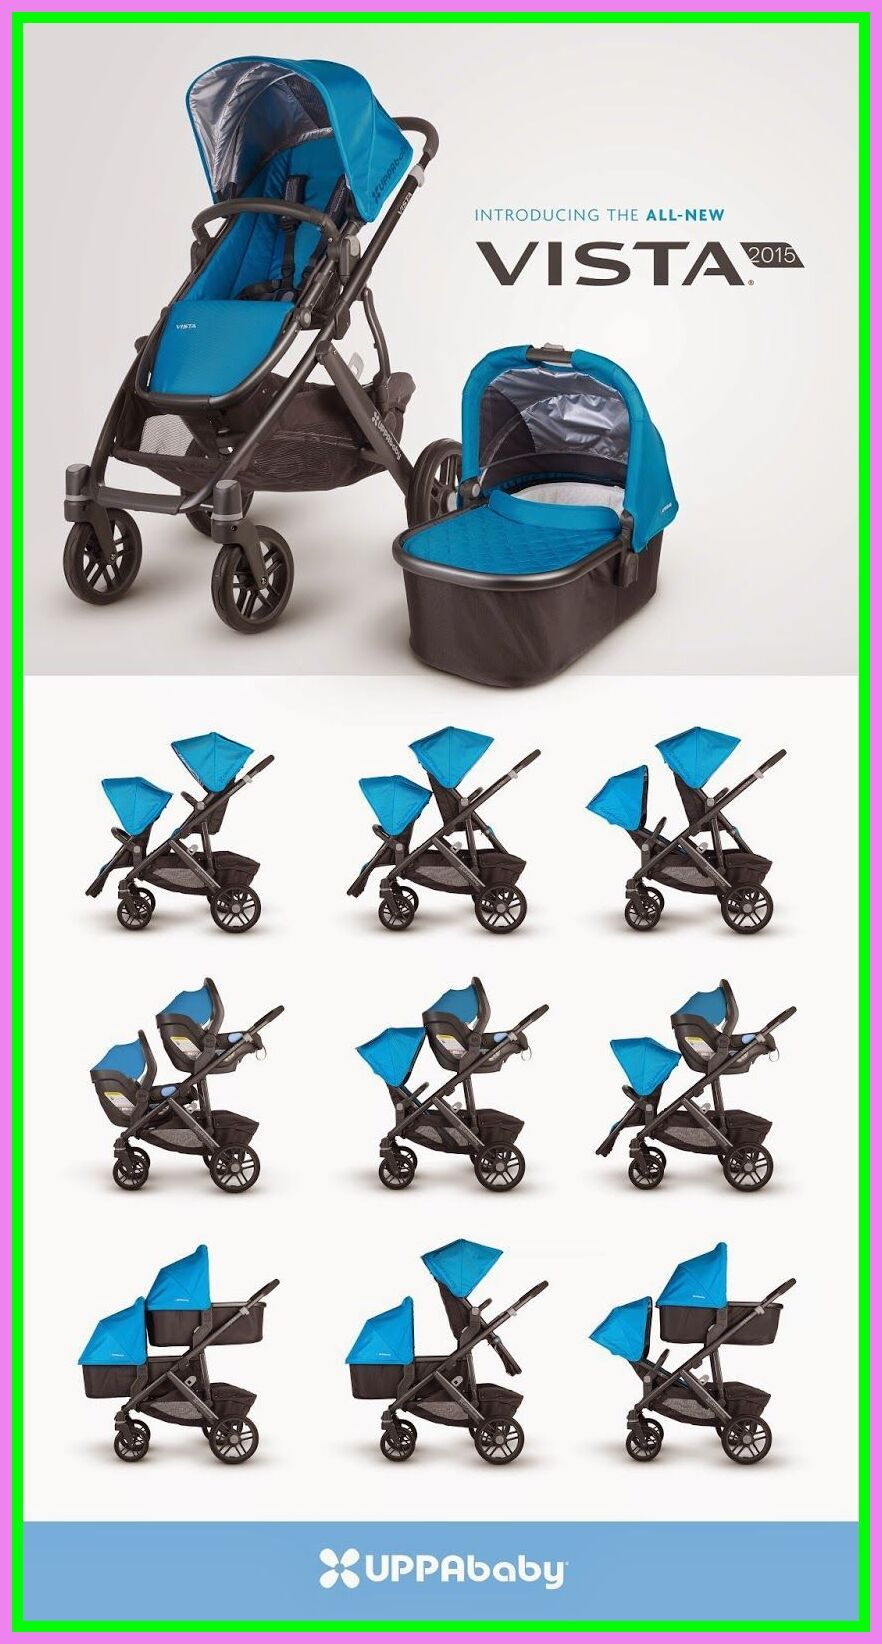 32+ Vista double stroller configurations ideas